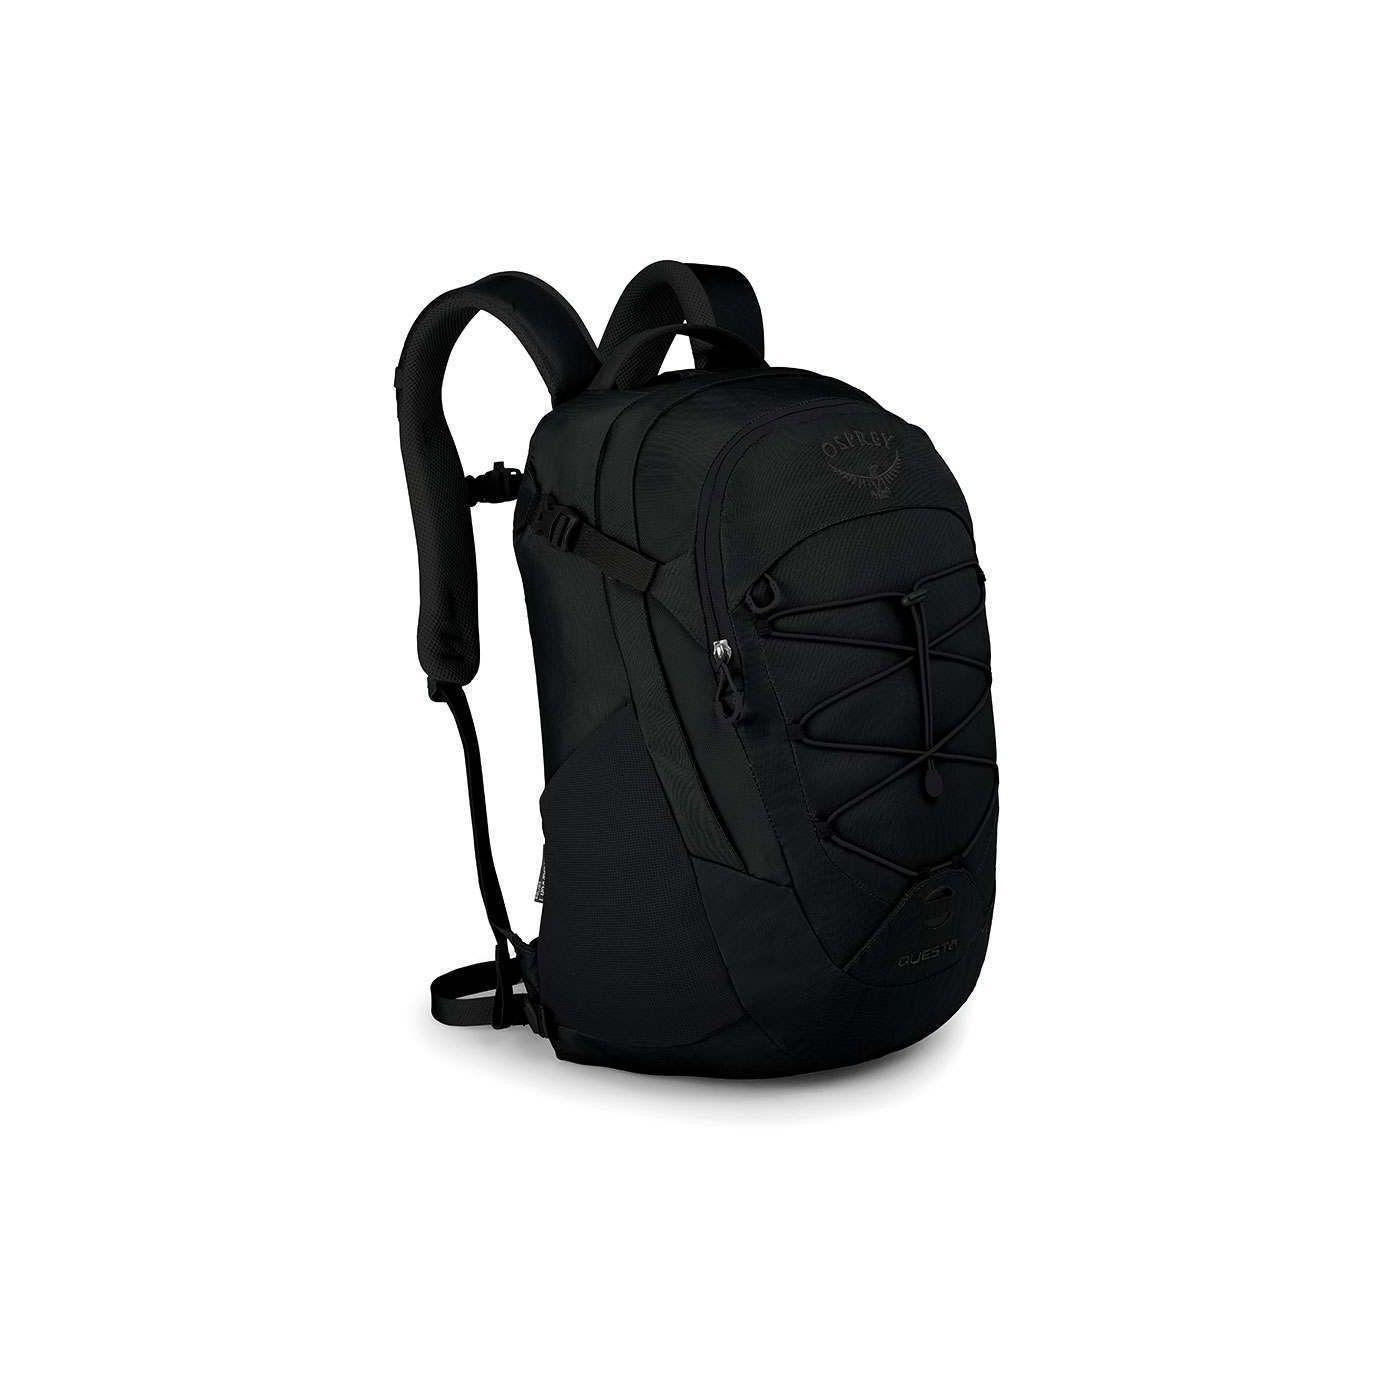 Women's backpack Osprey QUESTA 27